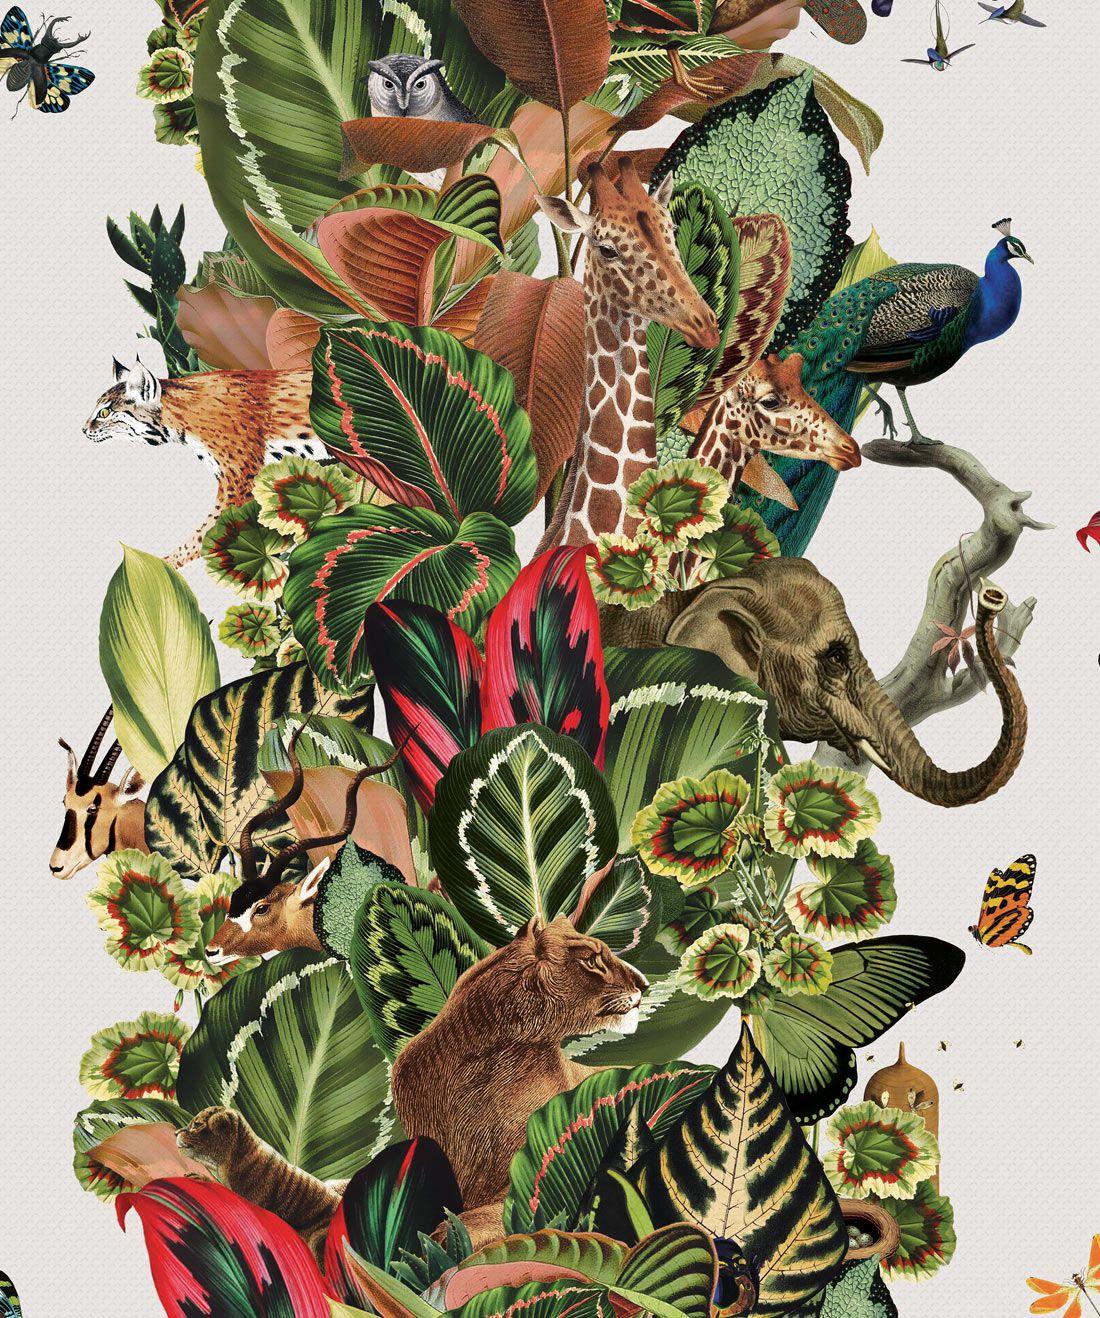 Viva Tropicana Wallpaper (Two Roll Set)